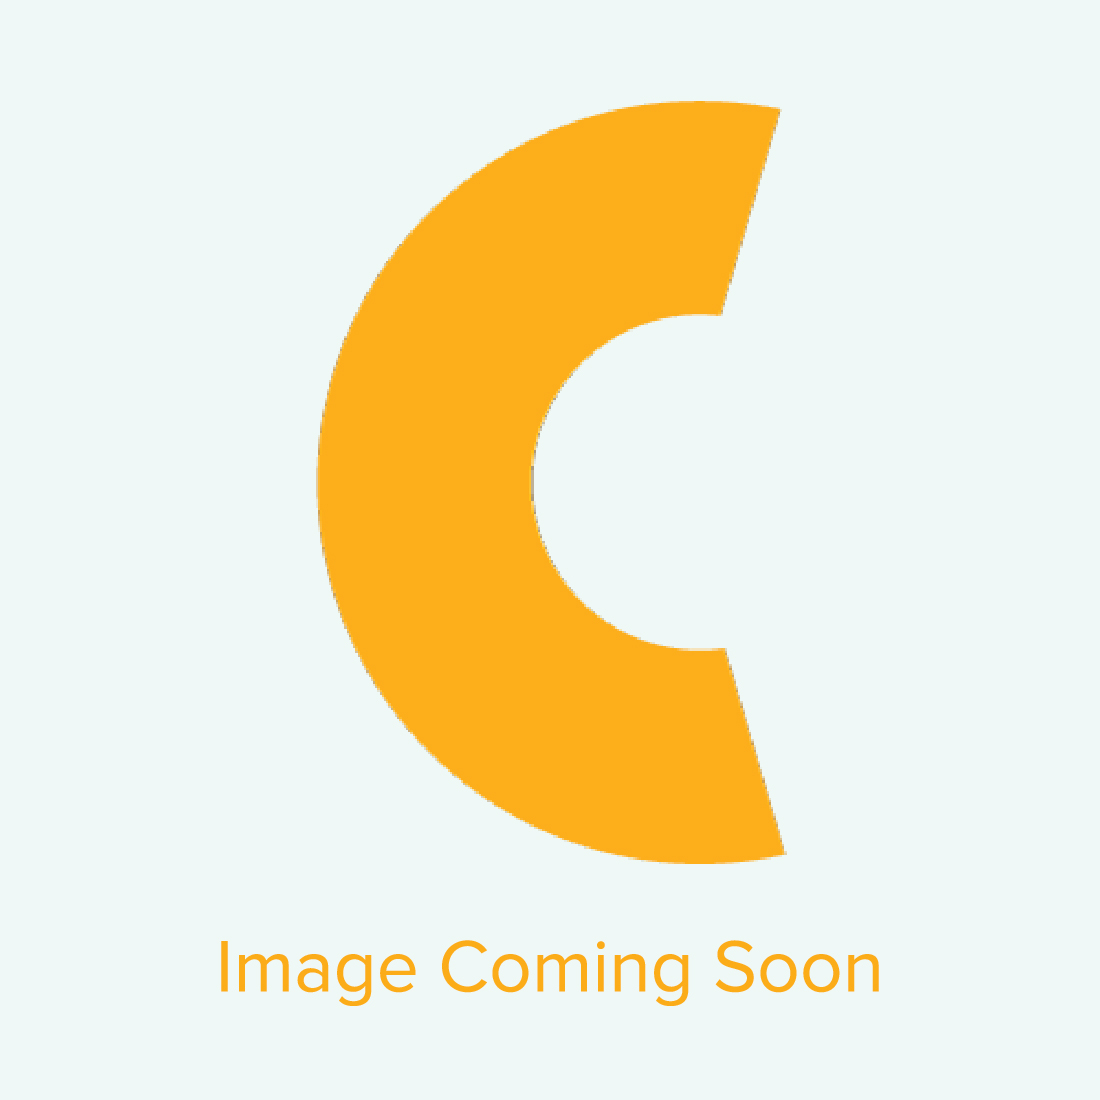 OKI Data Pro8432WT Replacement Toner Cartridges